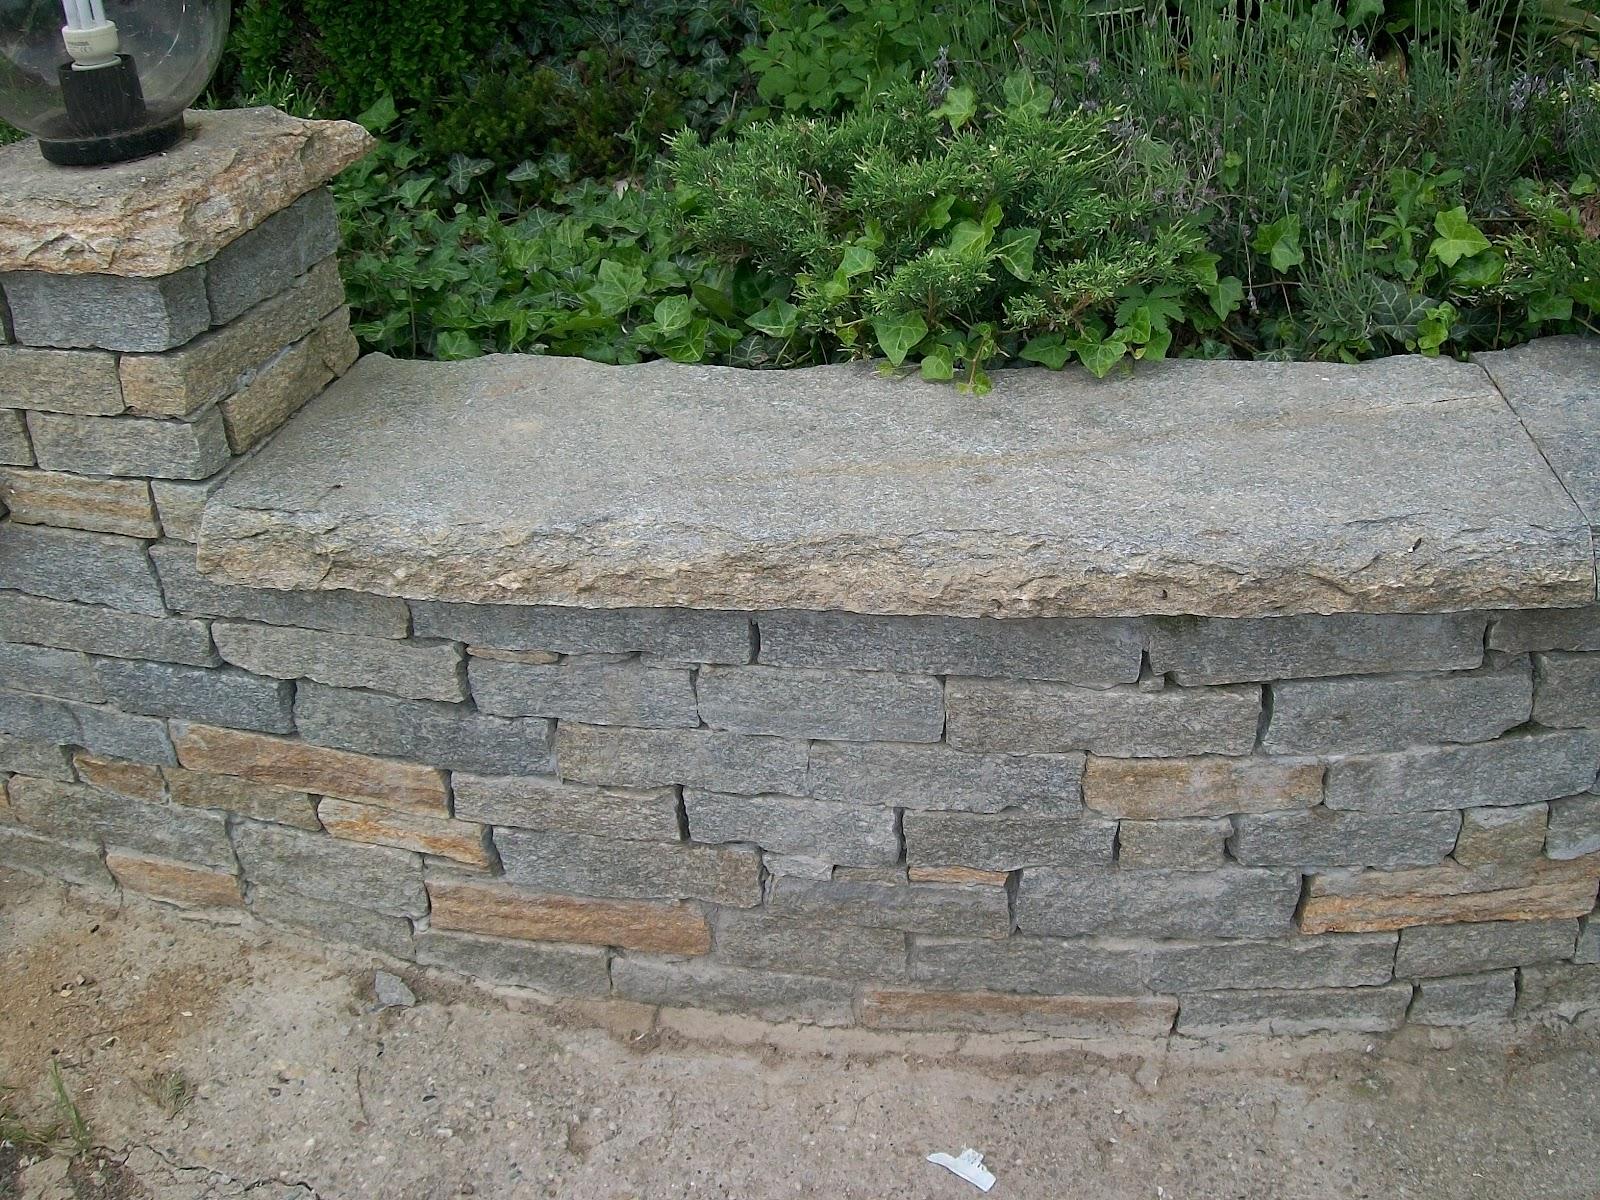 Muretti in pietra giardino - Muretti in pietra giardino ...